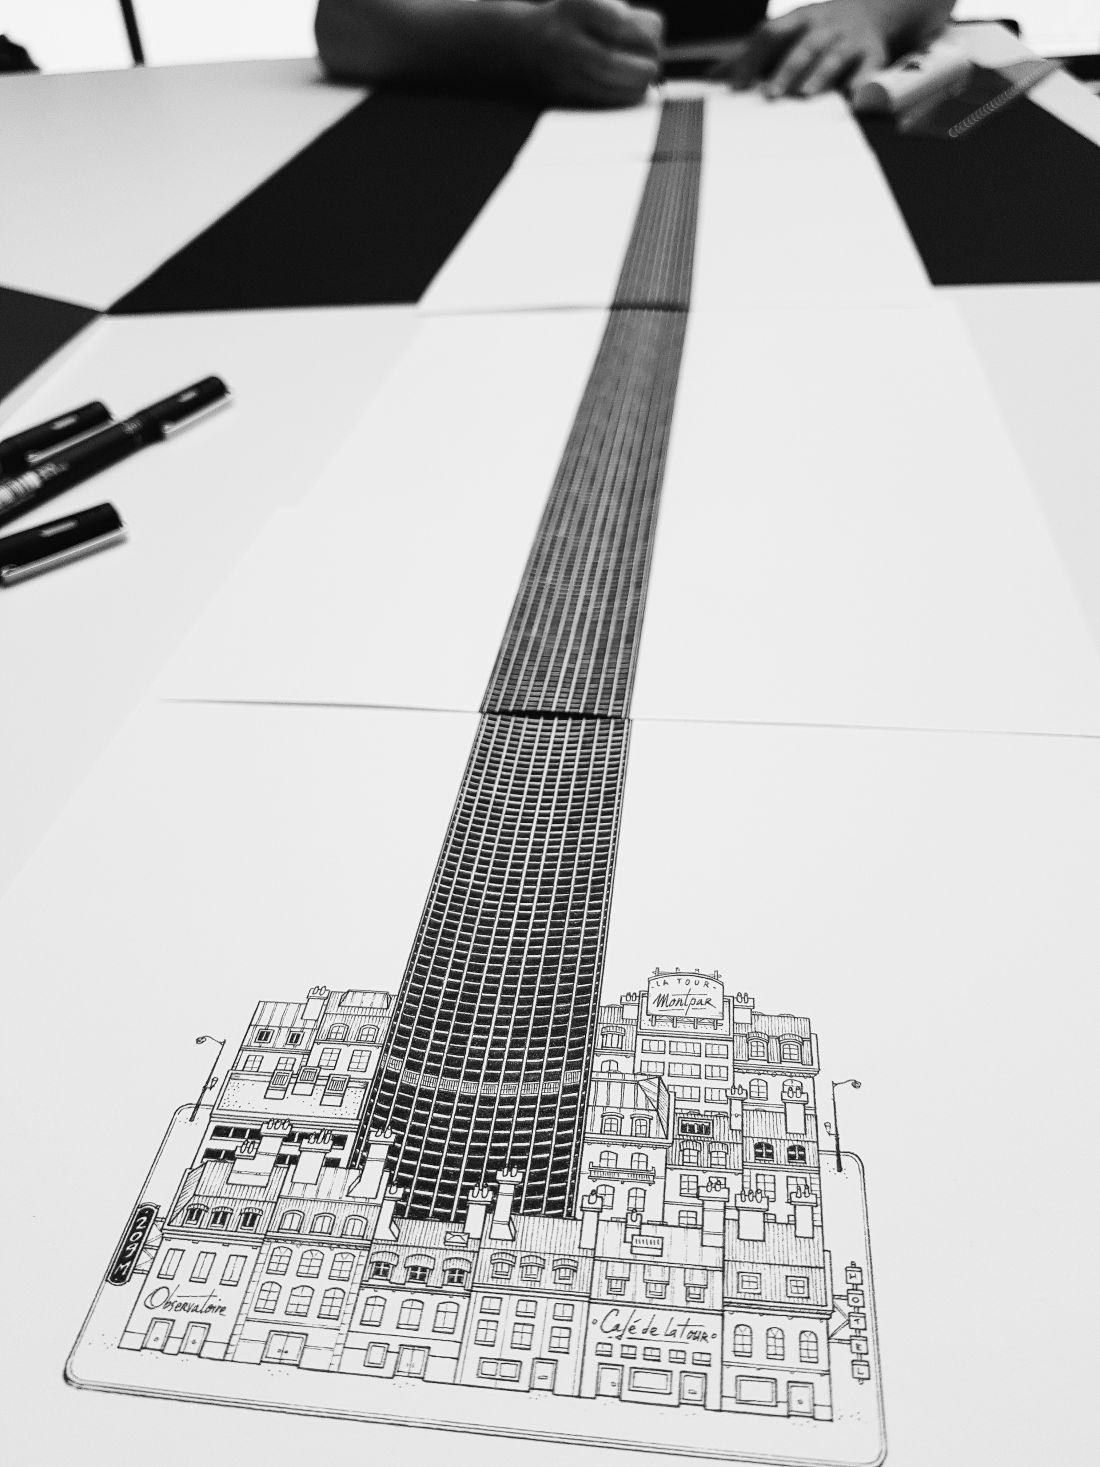 Tour Montparnasse illustration Docteur Paper